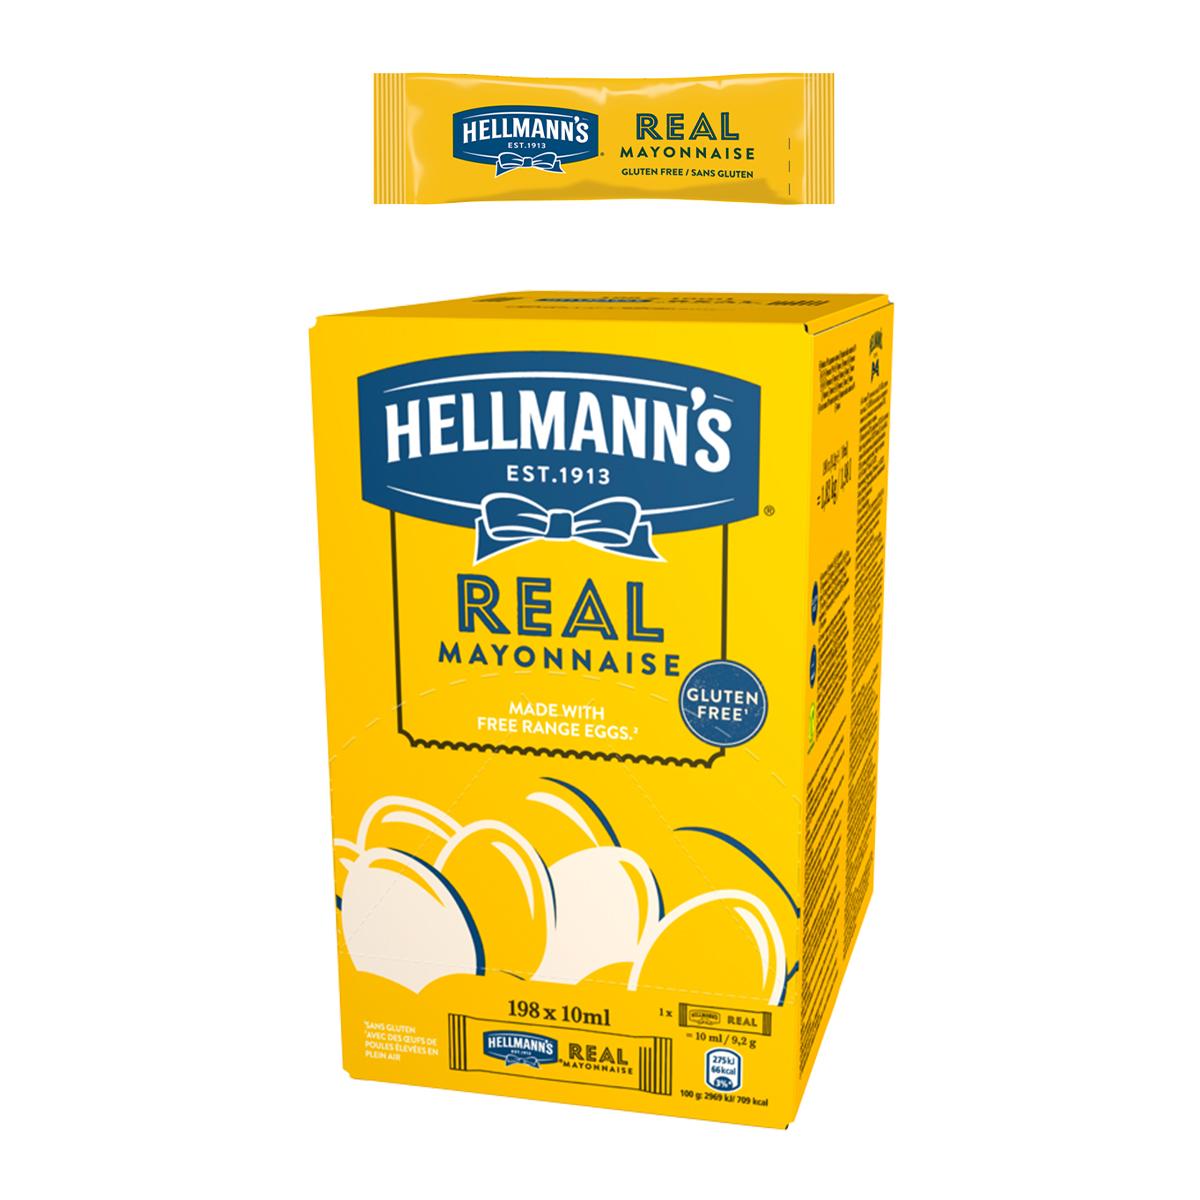 Hellmann's Майонеза Real доза 10 ml -